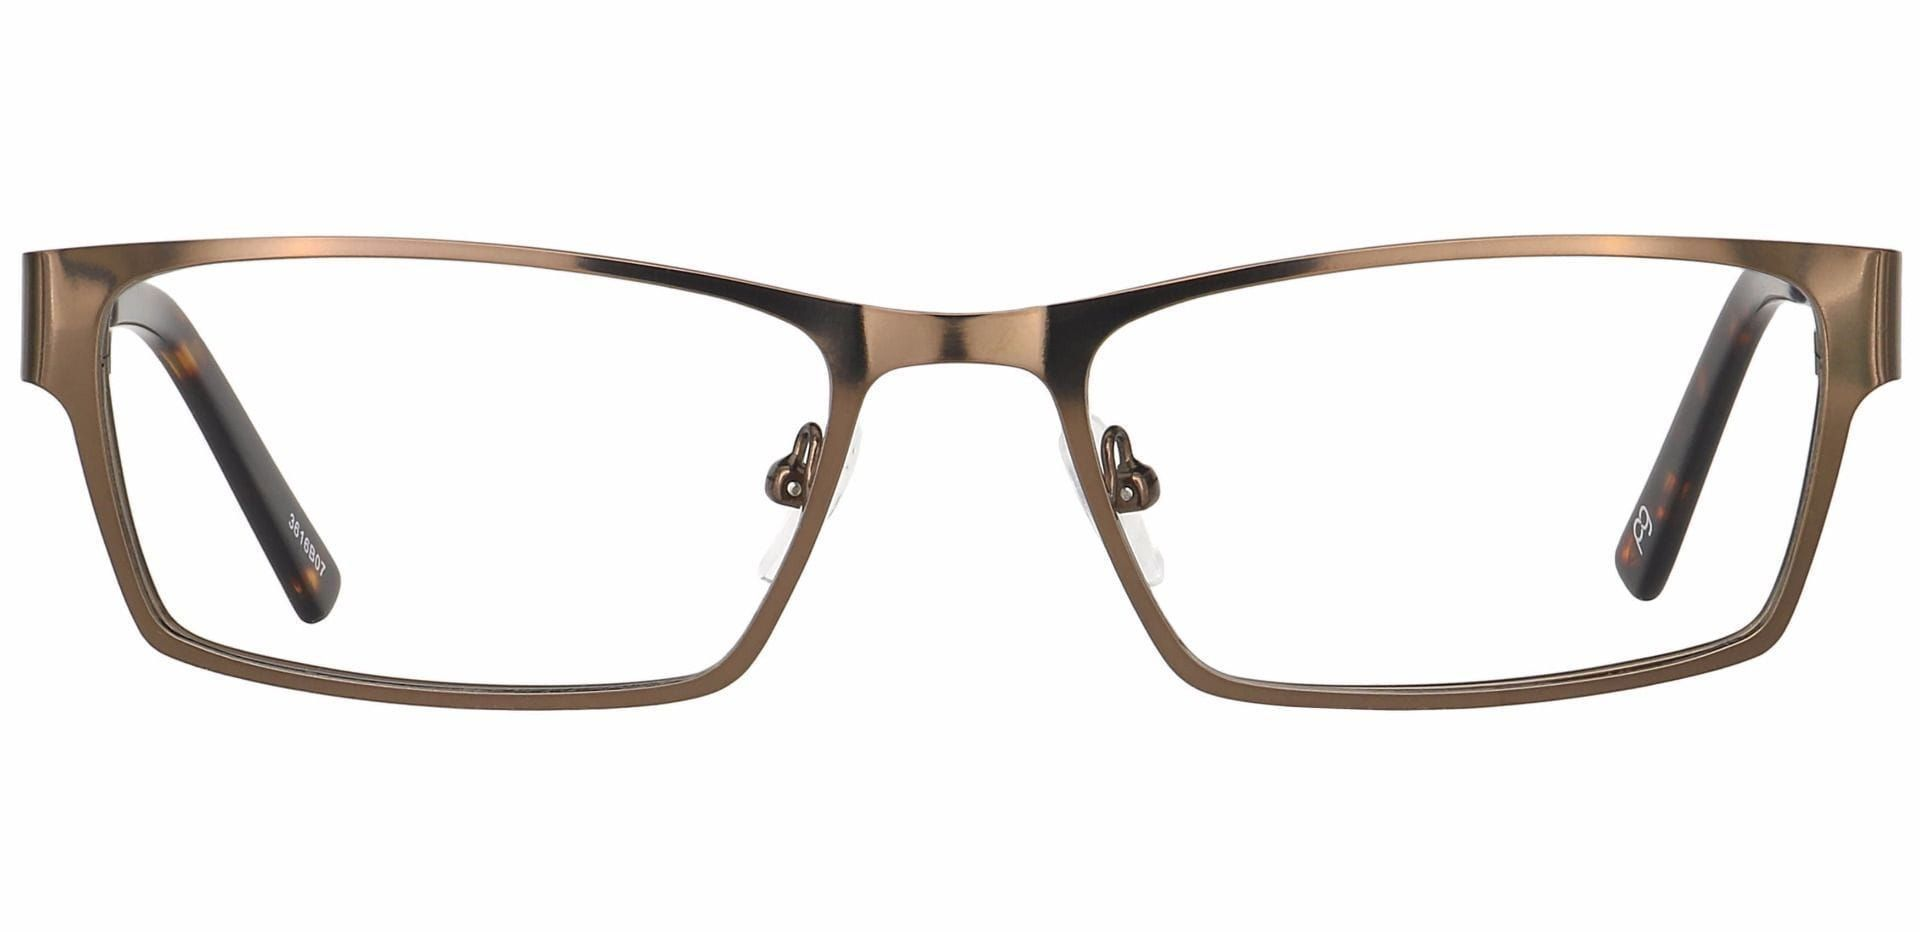 Vin Rectangle Progressive Glasses - Brown